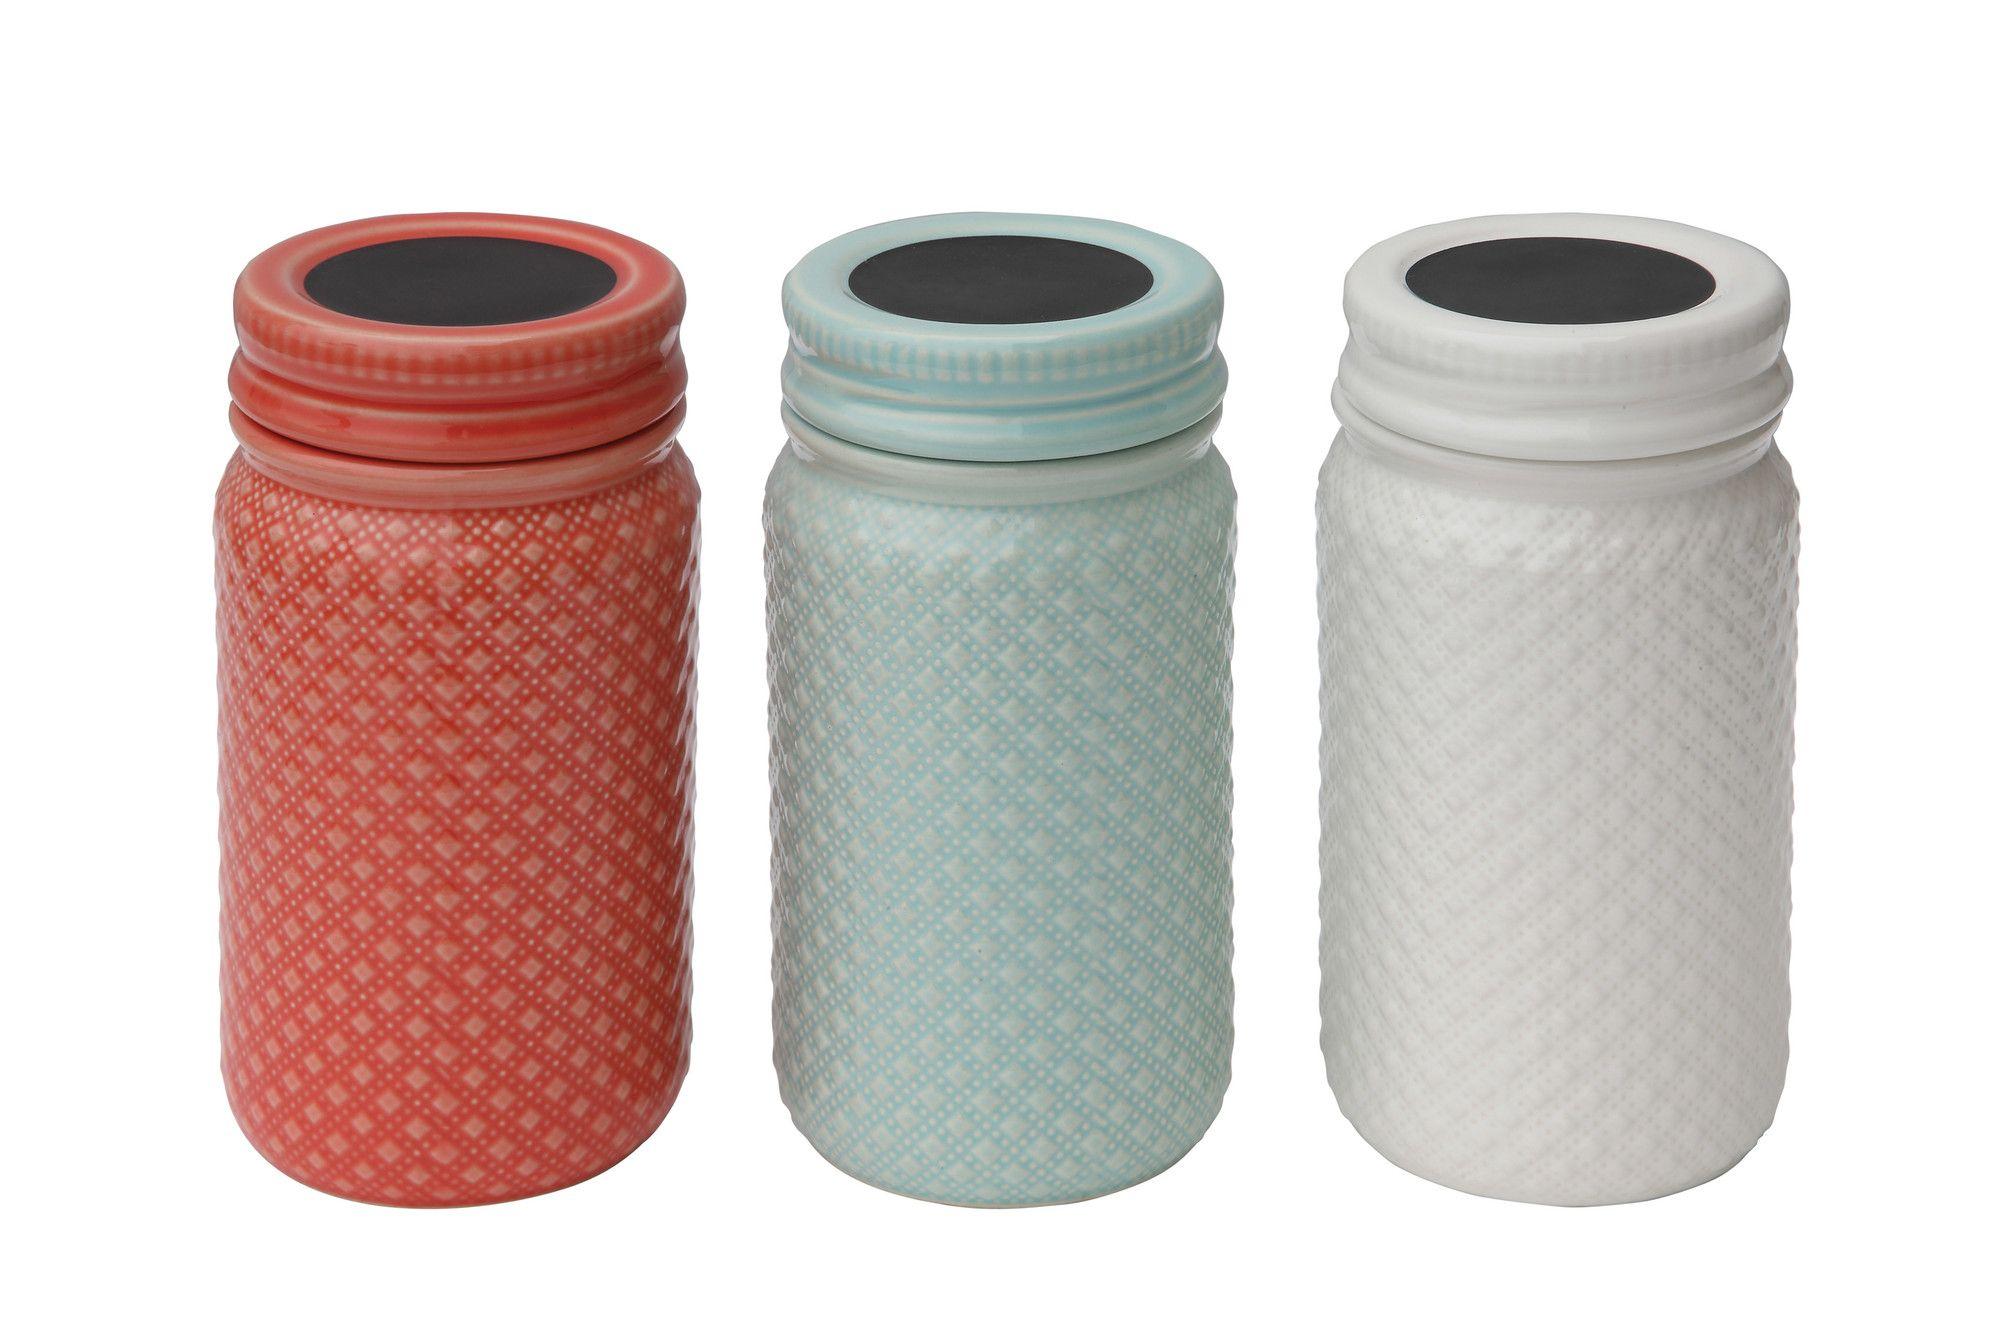 Olson 3-Piece Kitchen Canister Set | Products | Pinterest | Kitchen ...